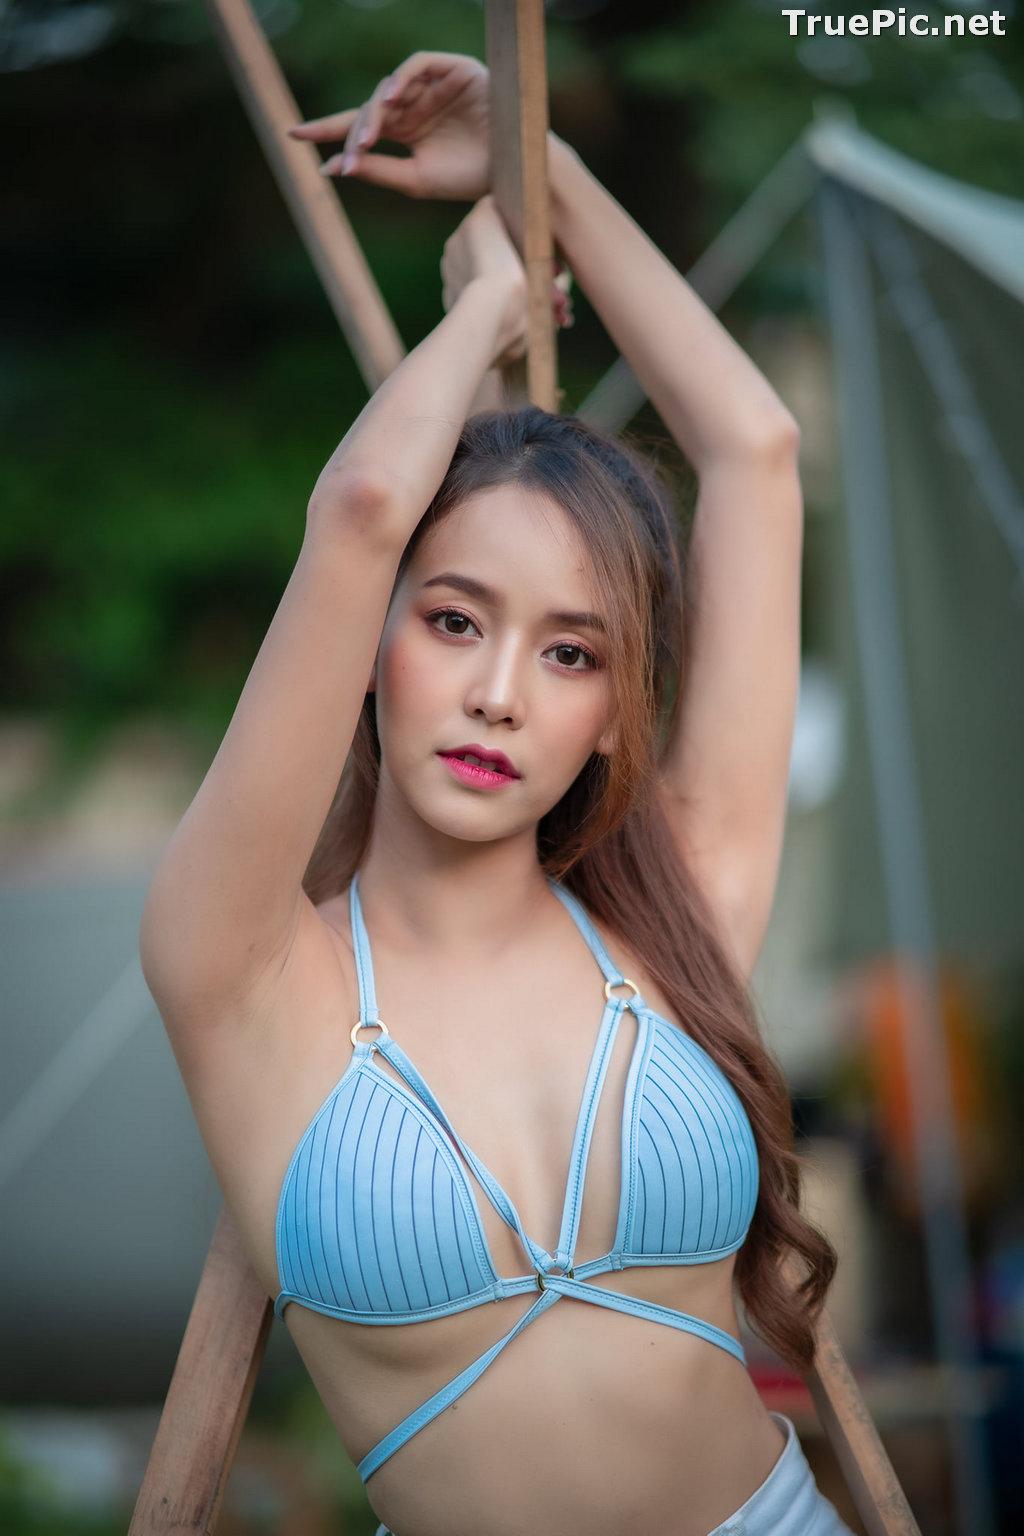 Image Thailand Model - Noppawan Limapirak (น้องเมย์) - Beautiful Picture 2021 Collection - TruePic.net - Picture-9